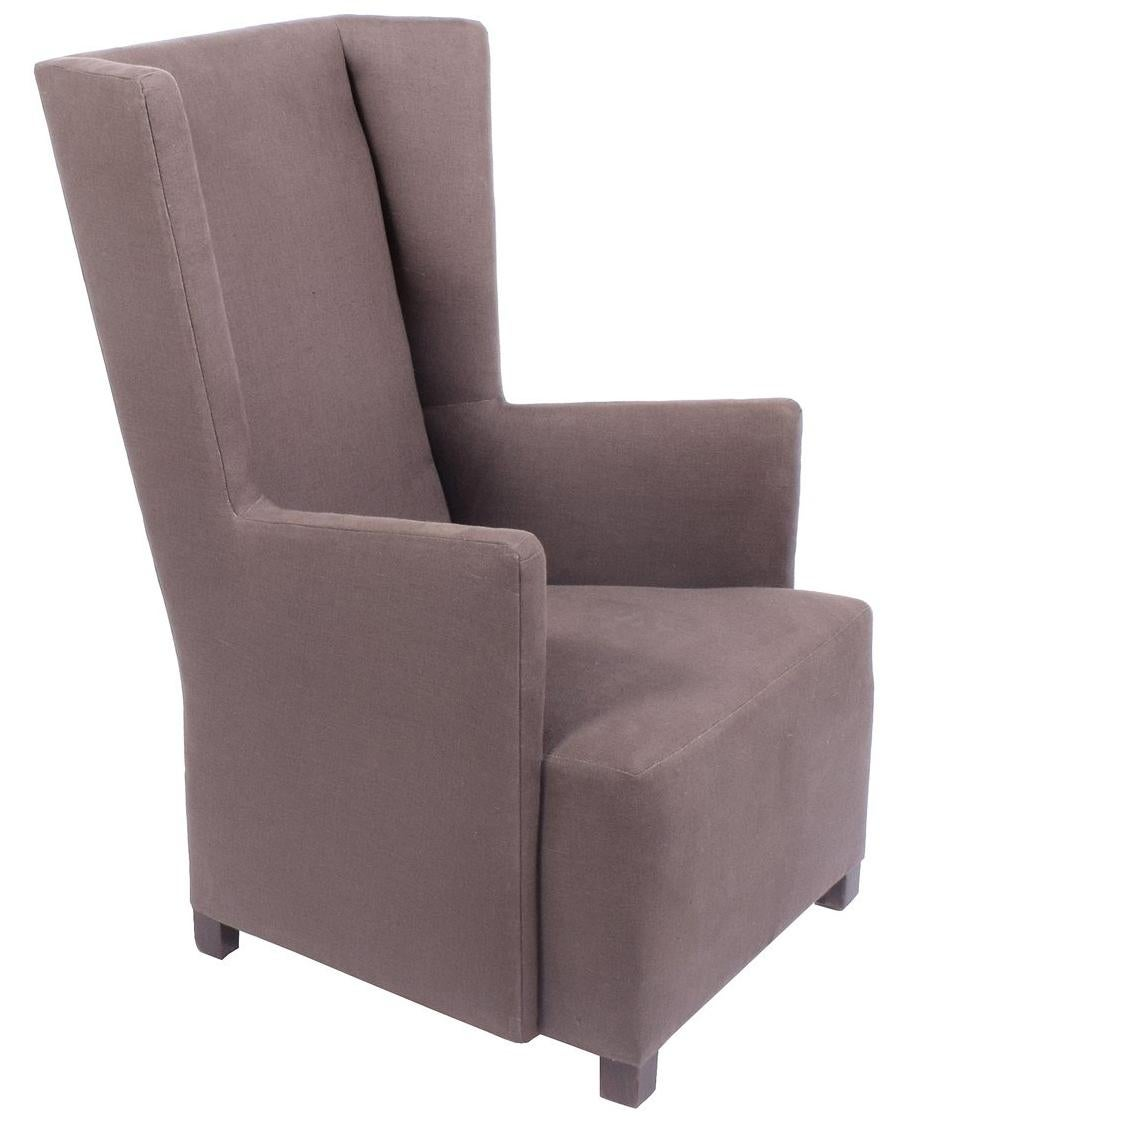 Attrayant Easy Chair By Uno Åhrén And Björn Trägådh For Sale